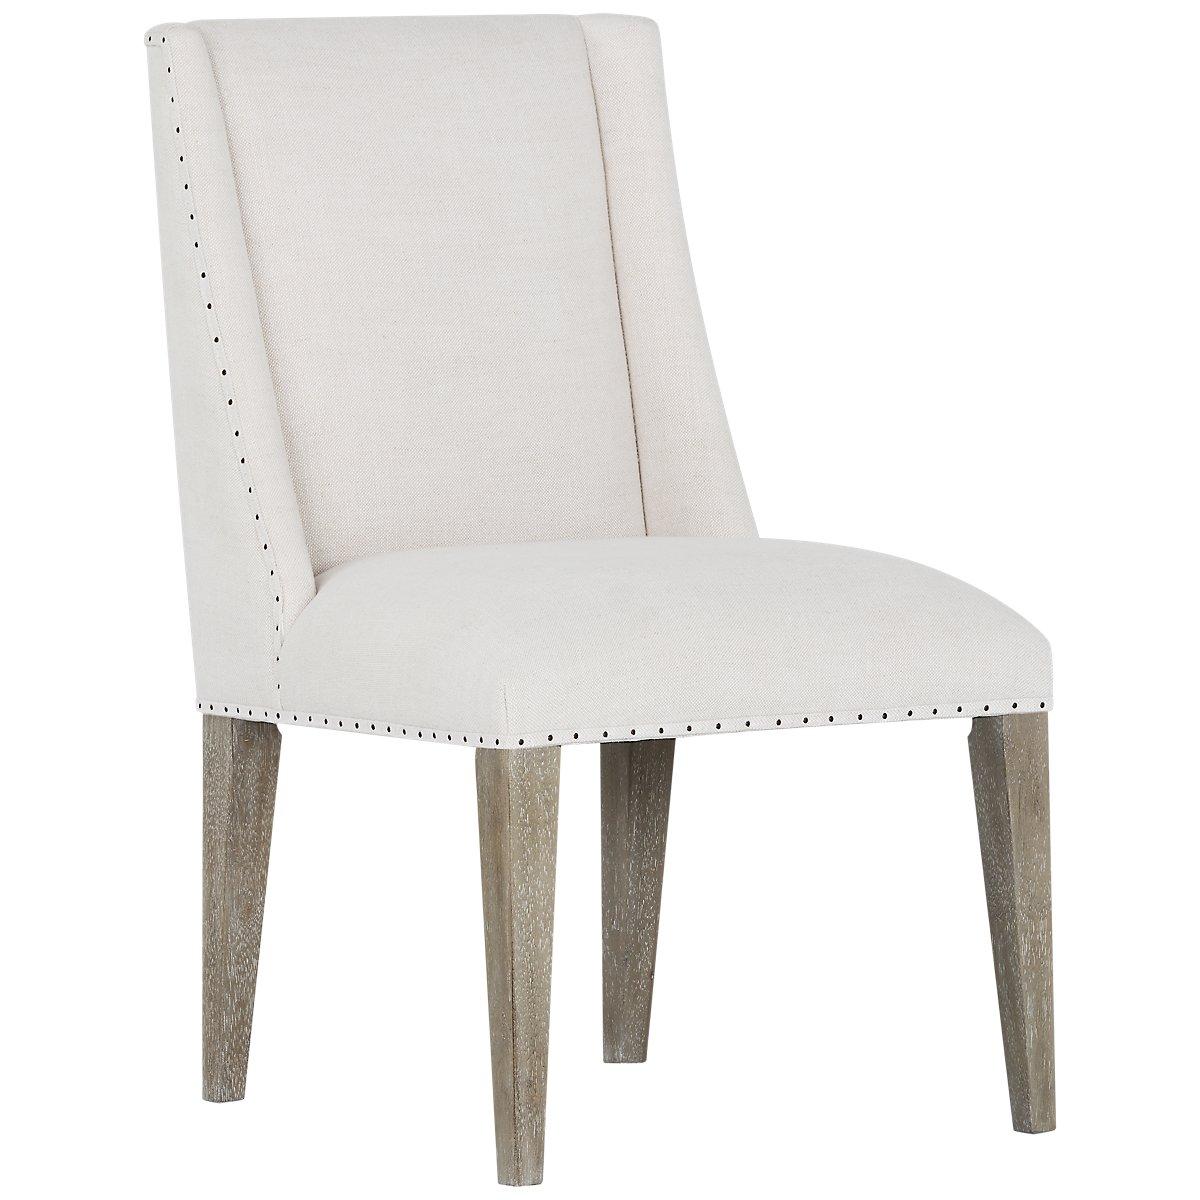 city furniture berlin white upholstered arm chair. Black Bedroom Furniture Sets. Home Design Ideas